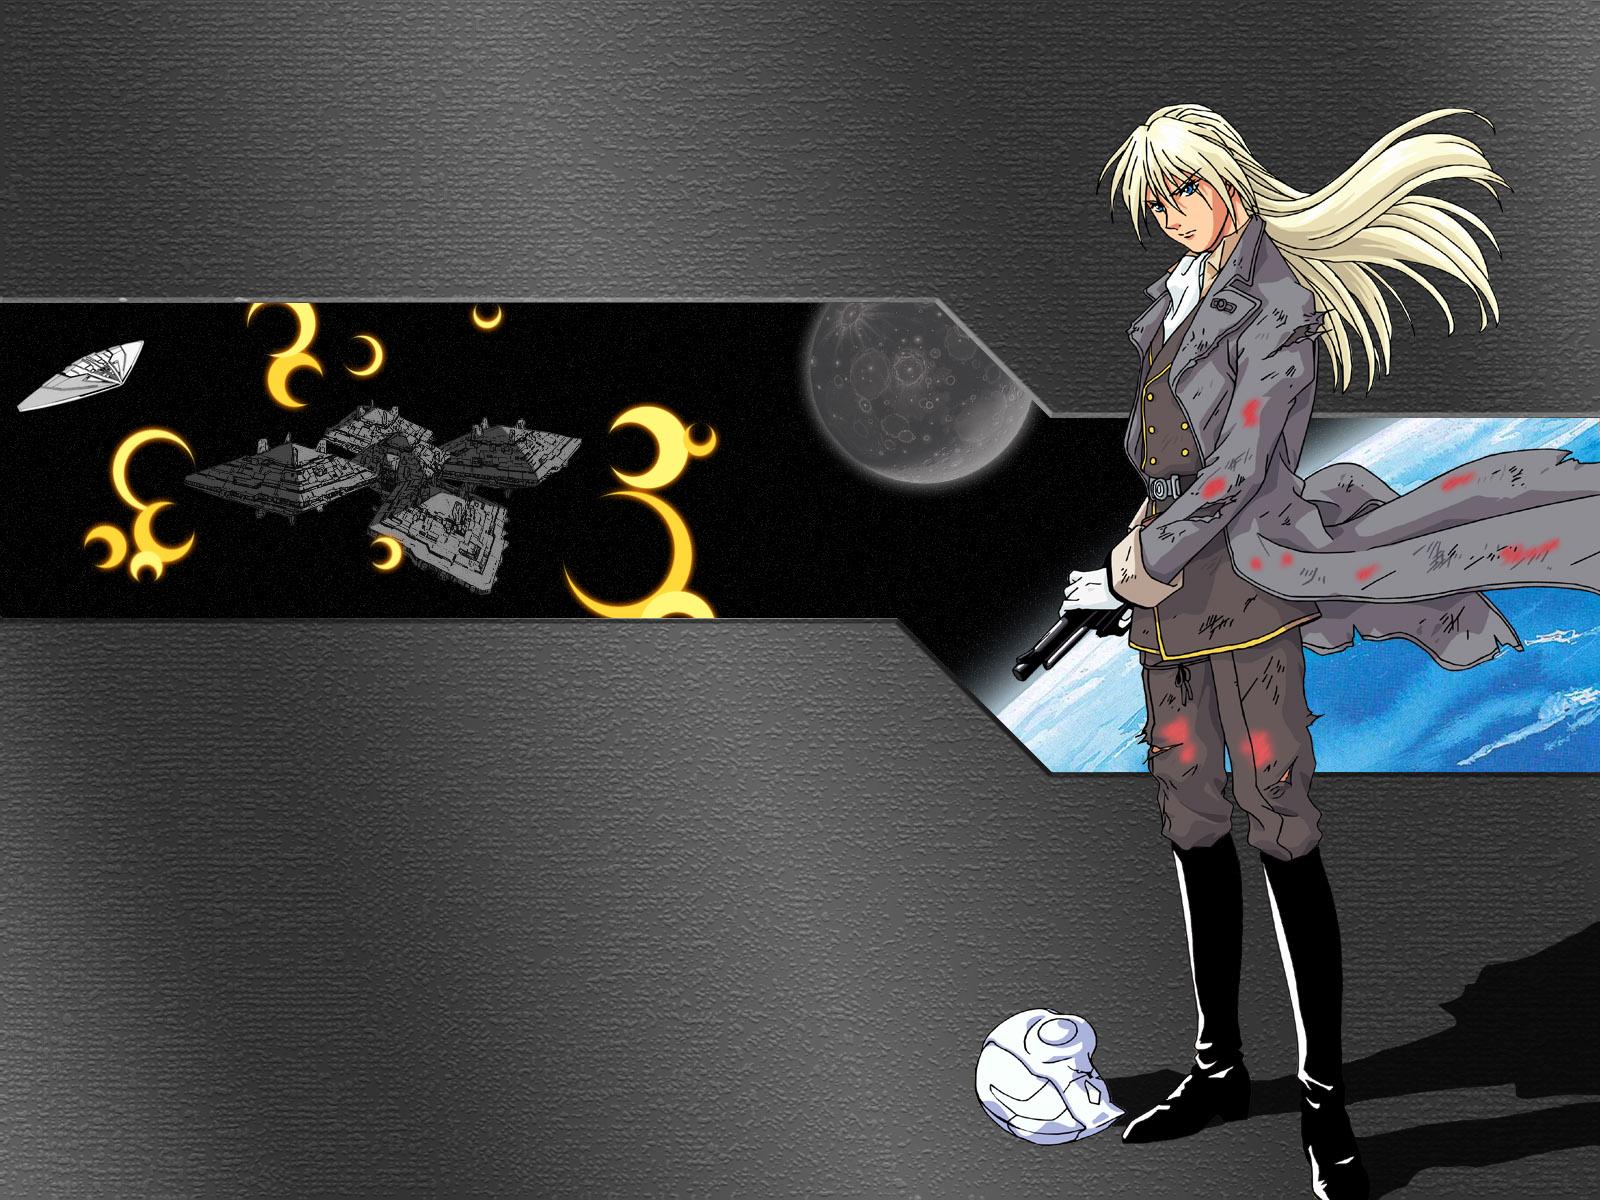 Mobile Suit Gundam Wing Wallpaper 1600x1200